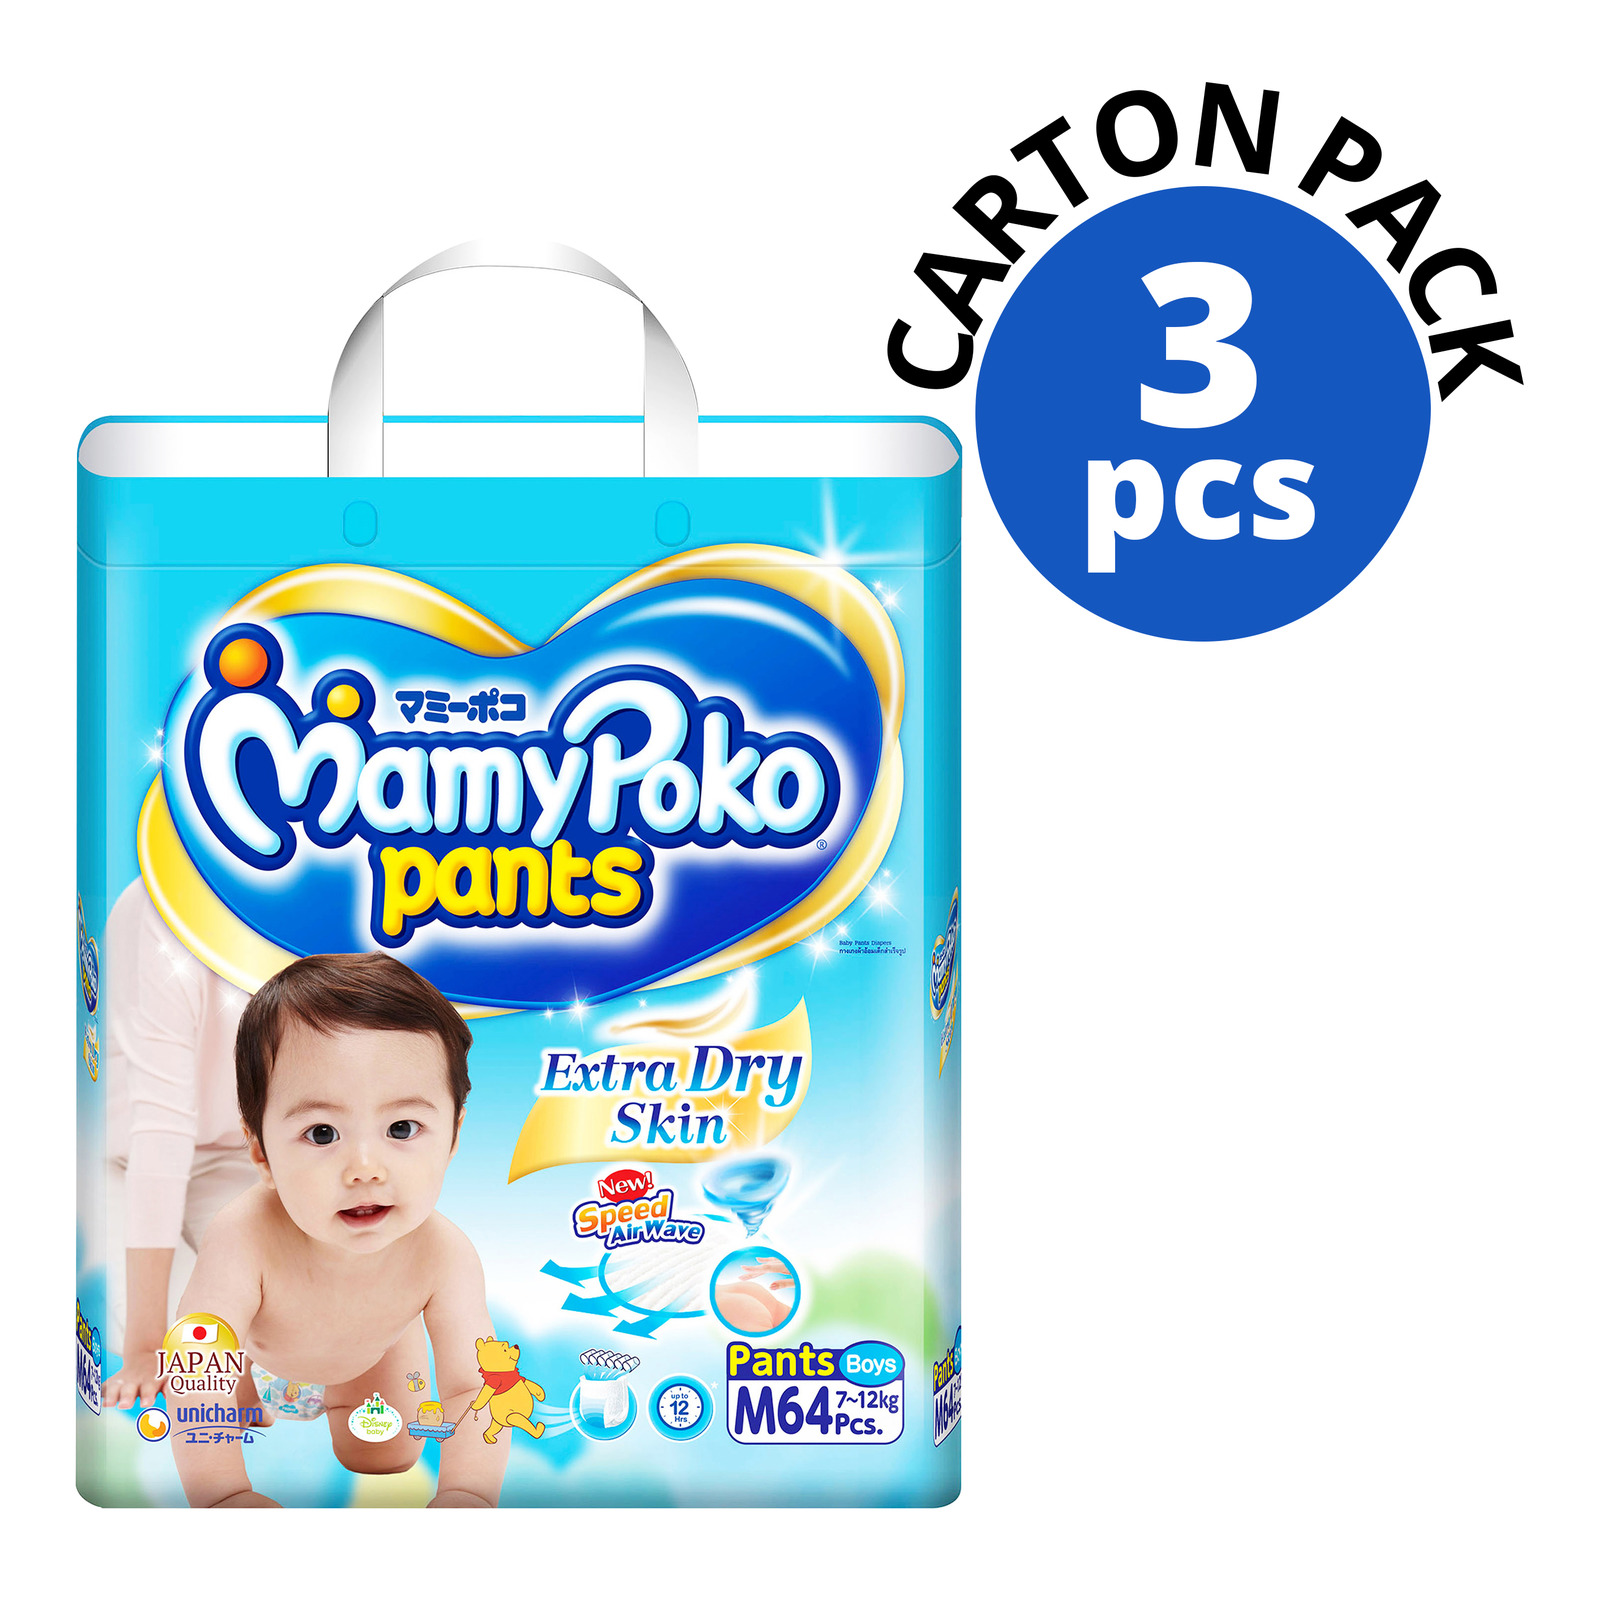 MamyPoko Extra Dry Skin Boy Pants - M (7-12kg)